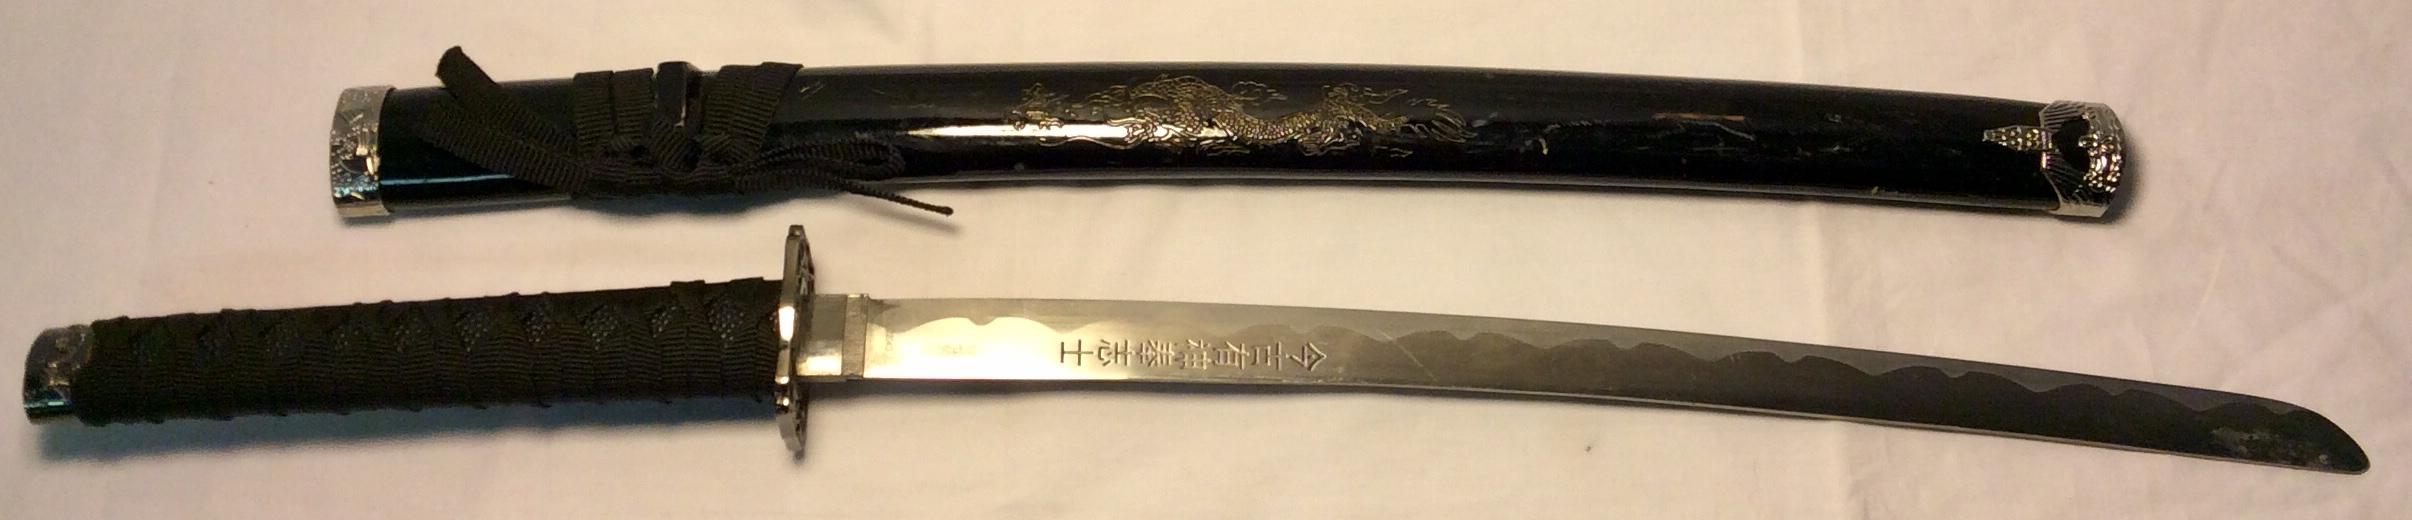 Stainless steel Wakizashi Sword